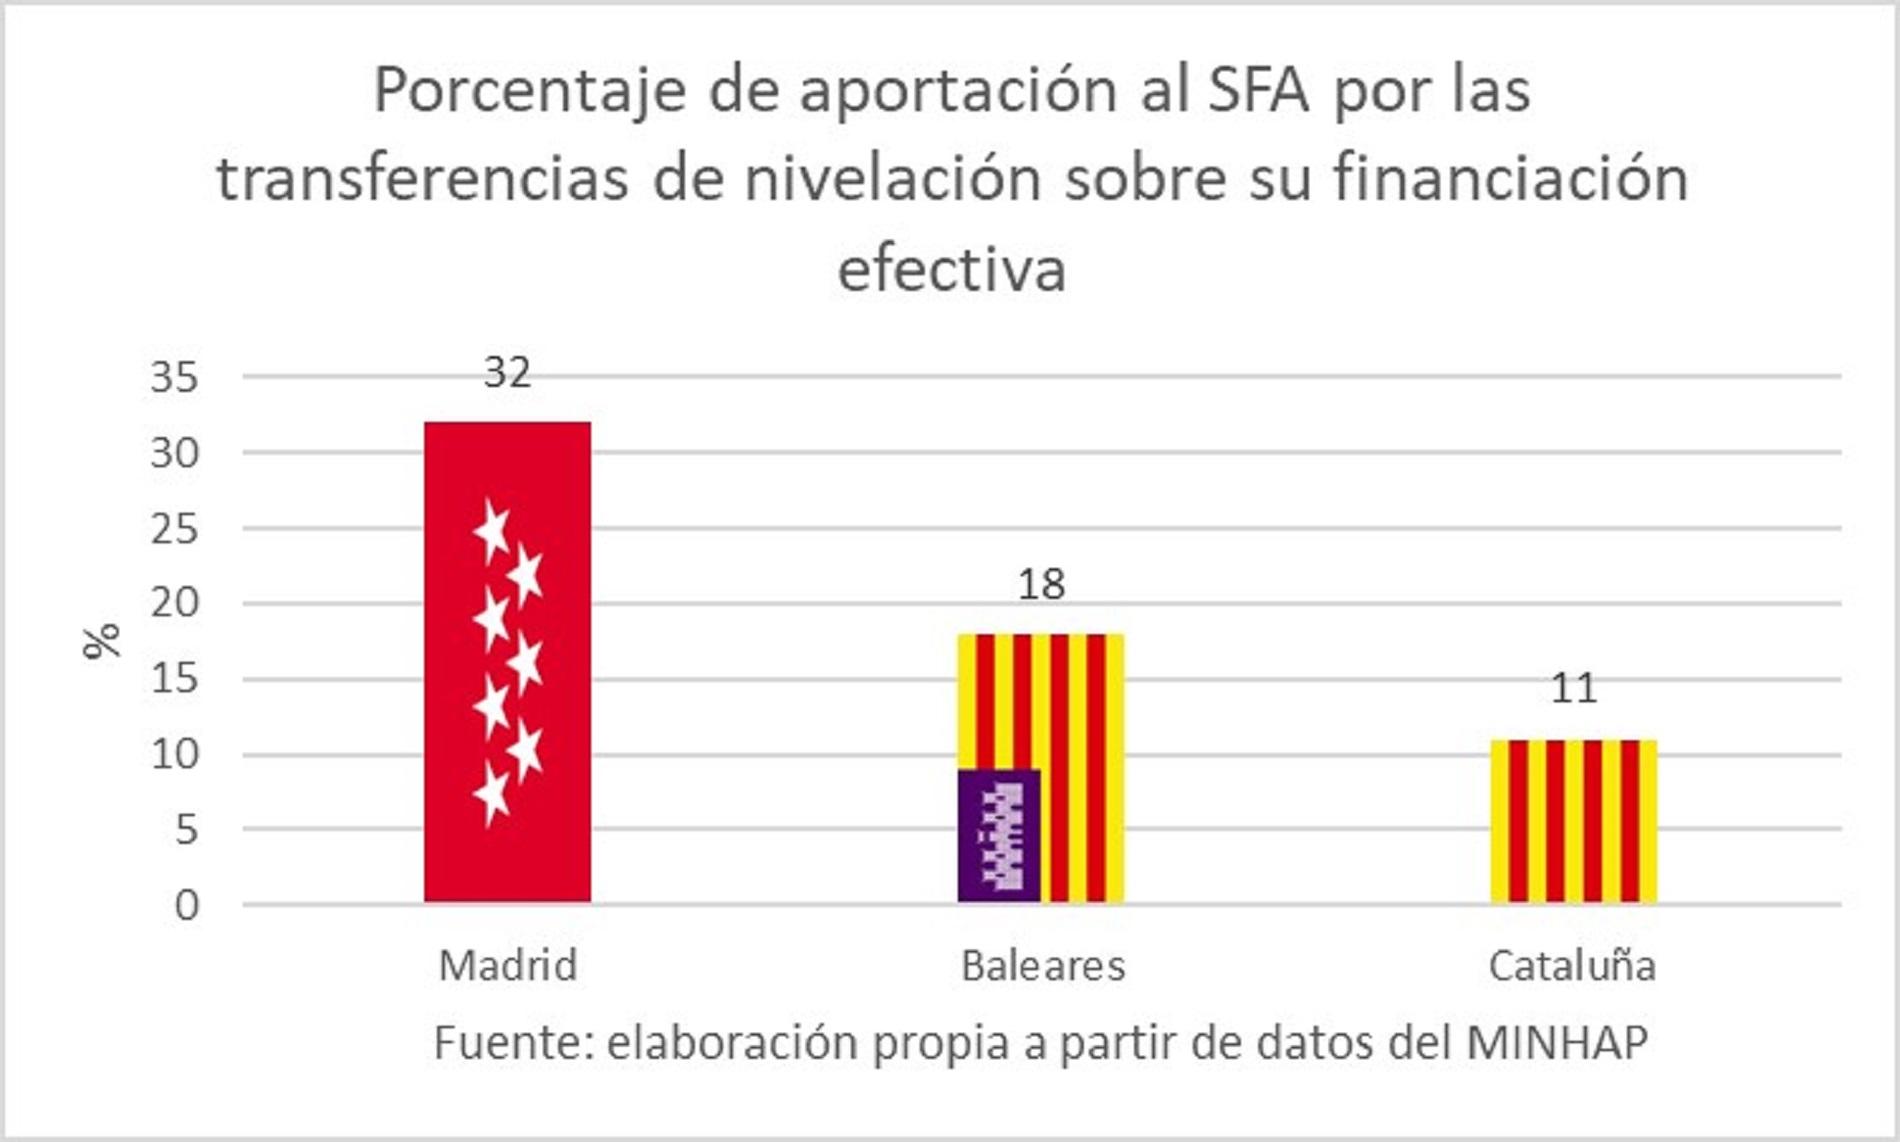 porcentaje-transferencias-nivelacion-sfa-madrid-cataluna-baleares.jpg